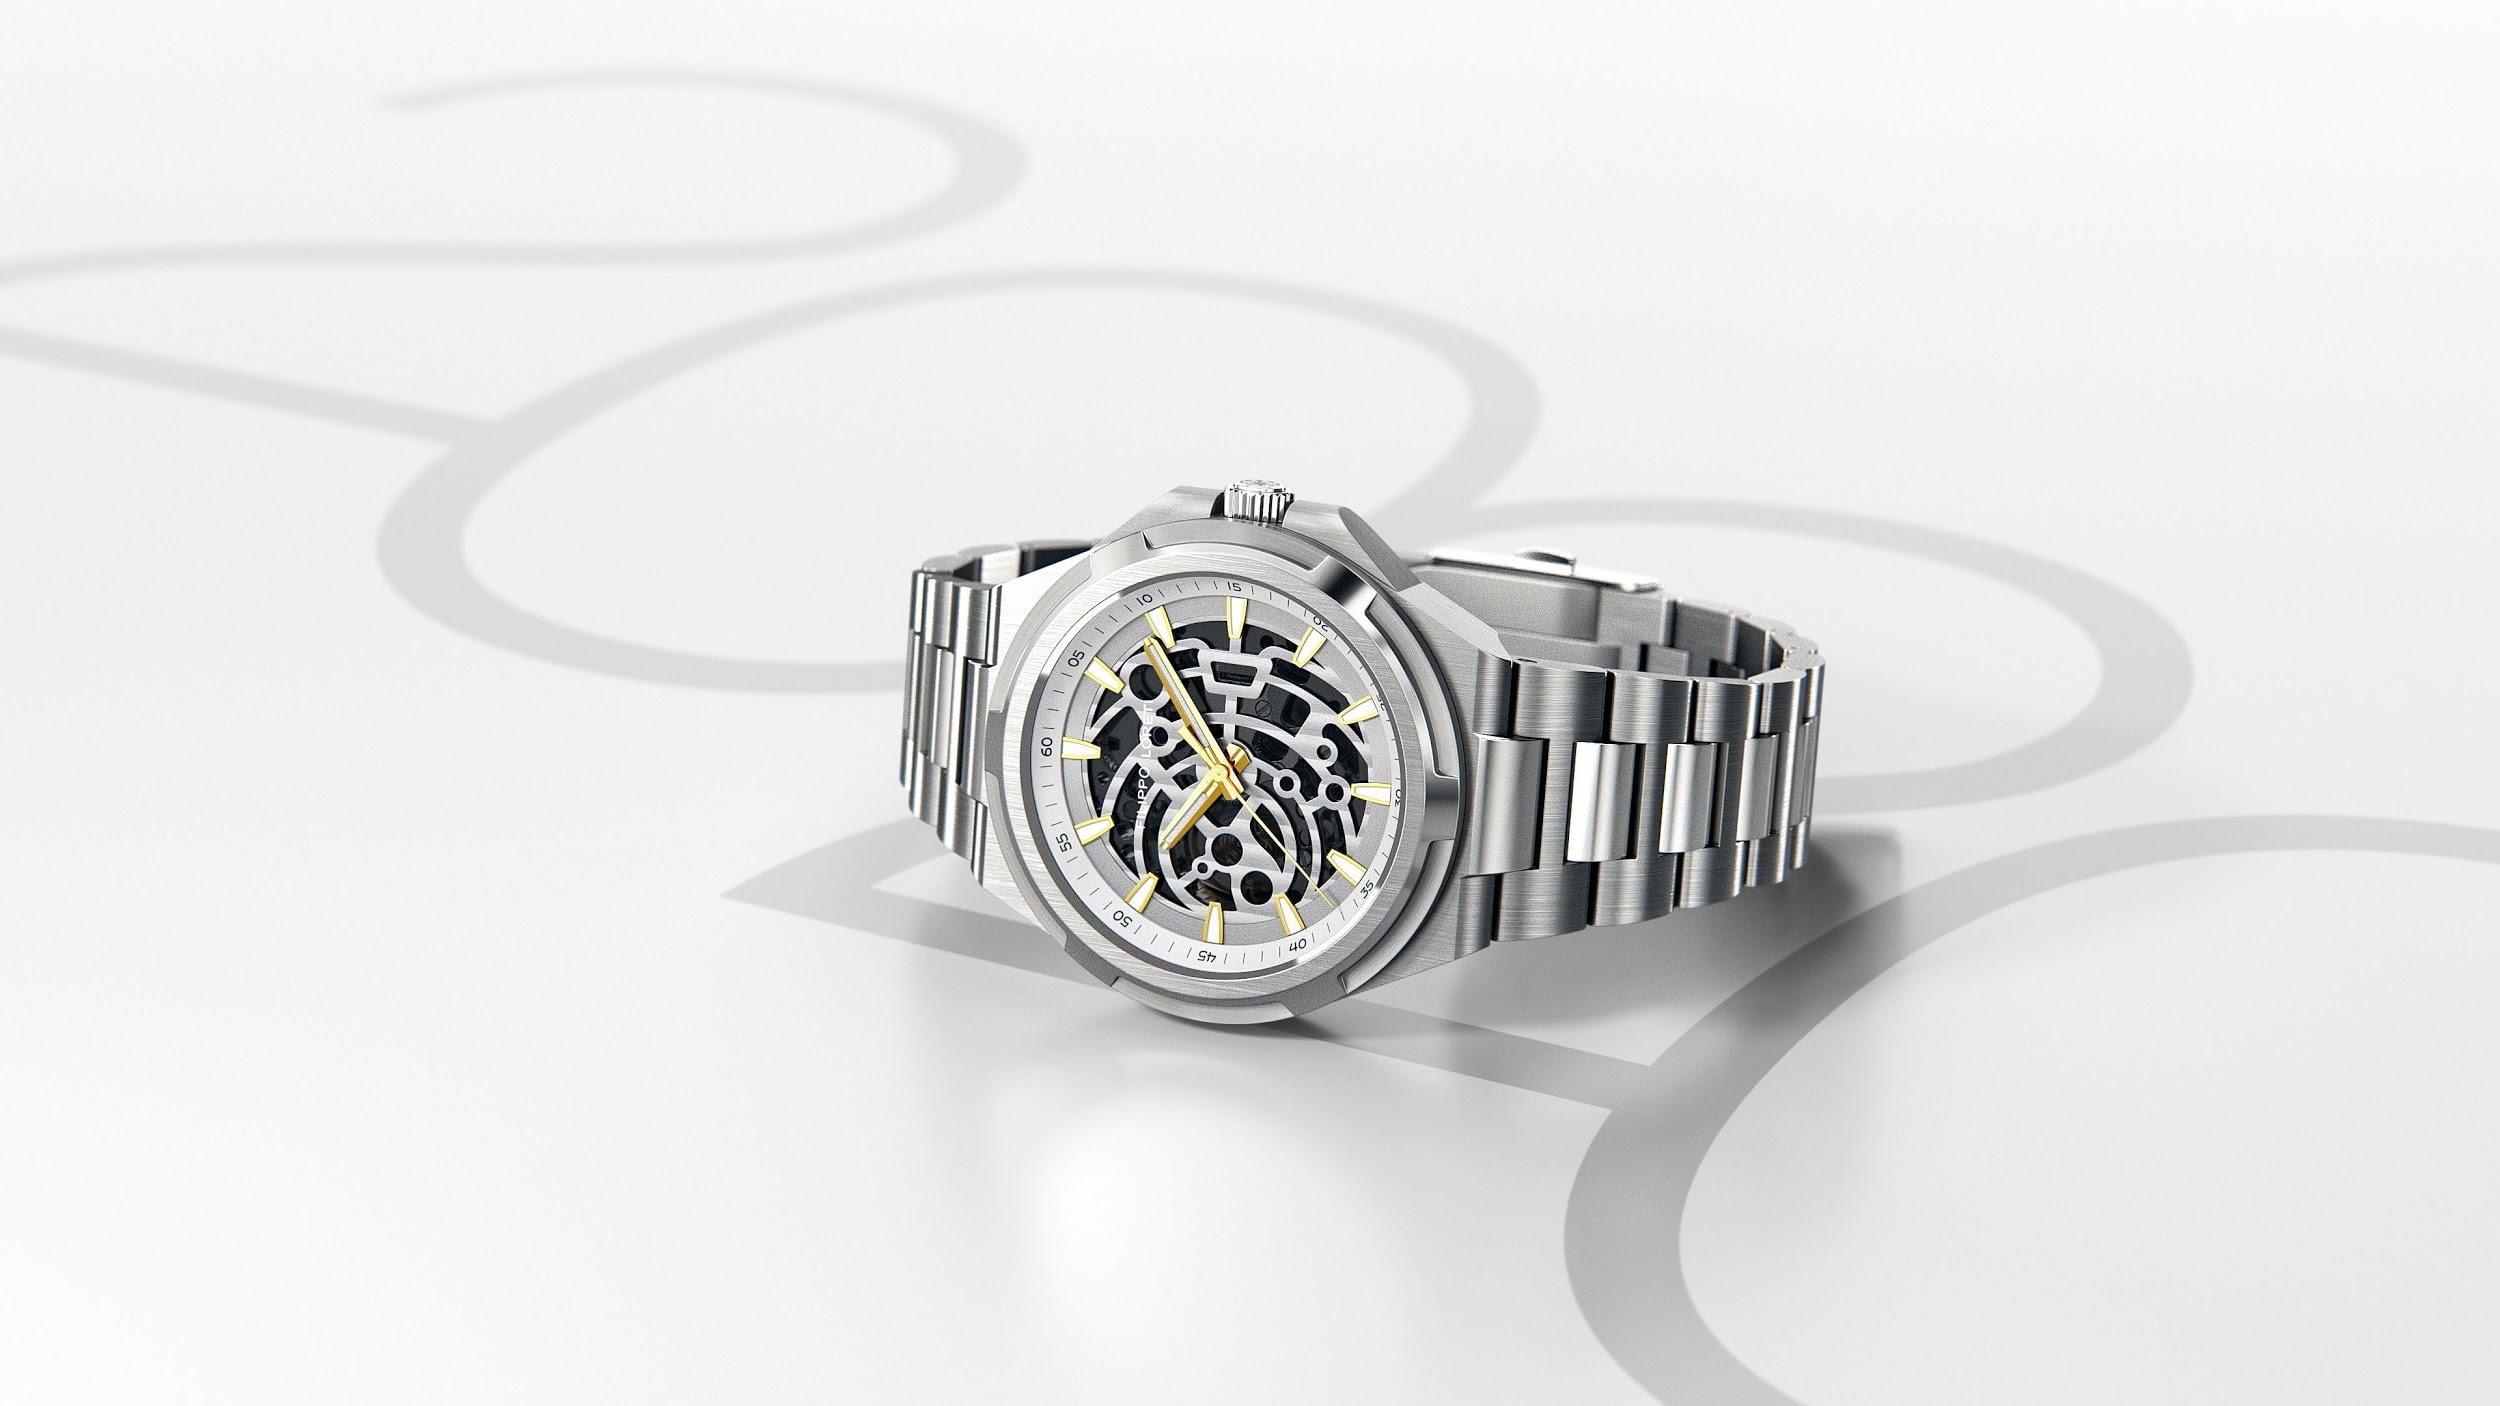 Skeleton Silver Royale Men's Watch from Filippo Loreti